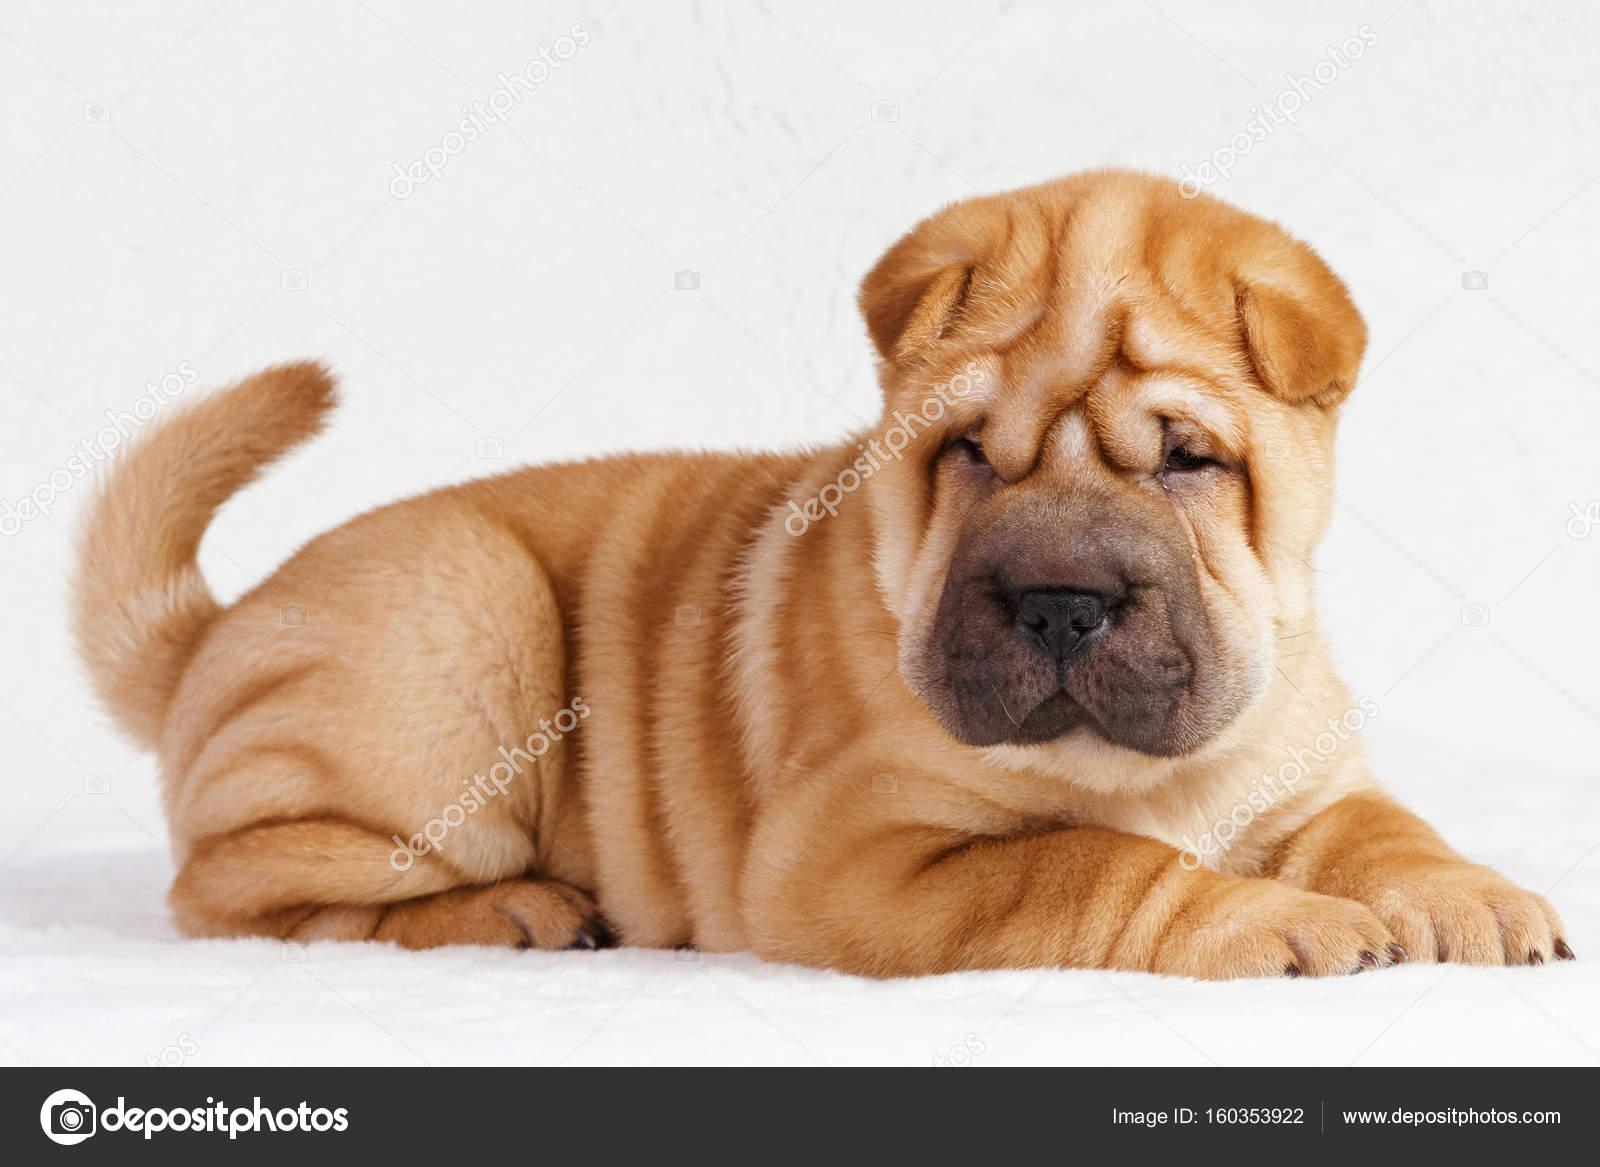 Cucciolo di cane shar pei — Foto Stock © rojer13.bk.ru #160353922